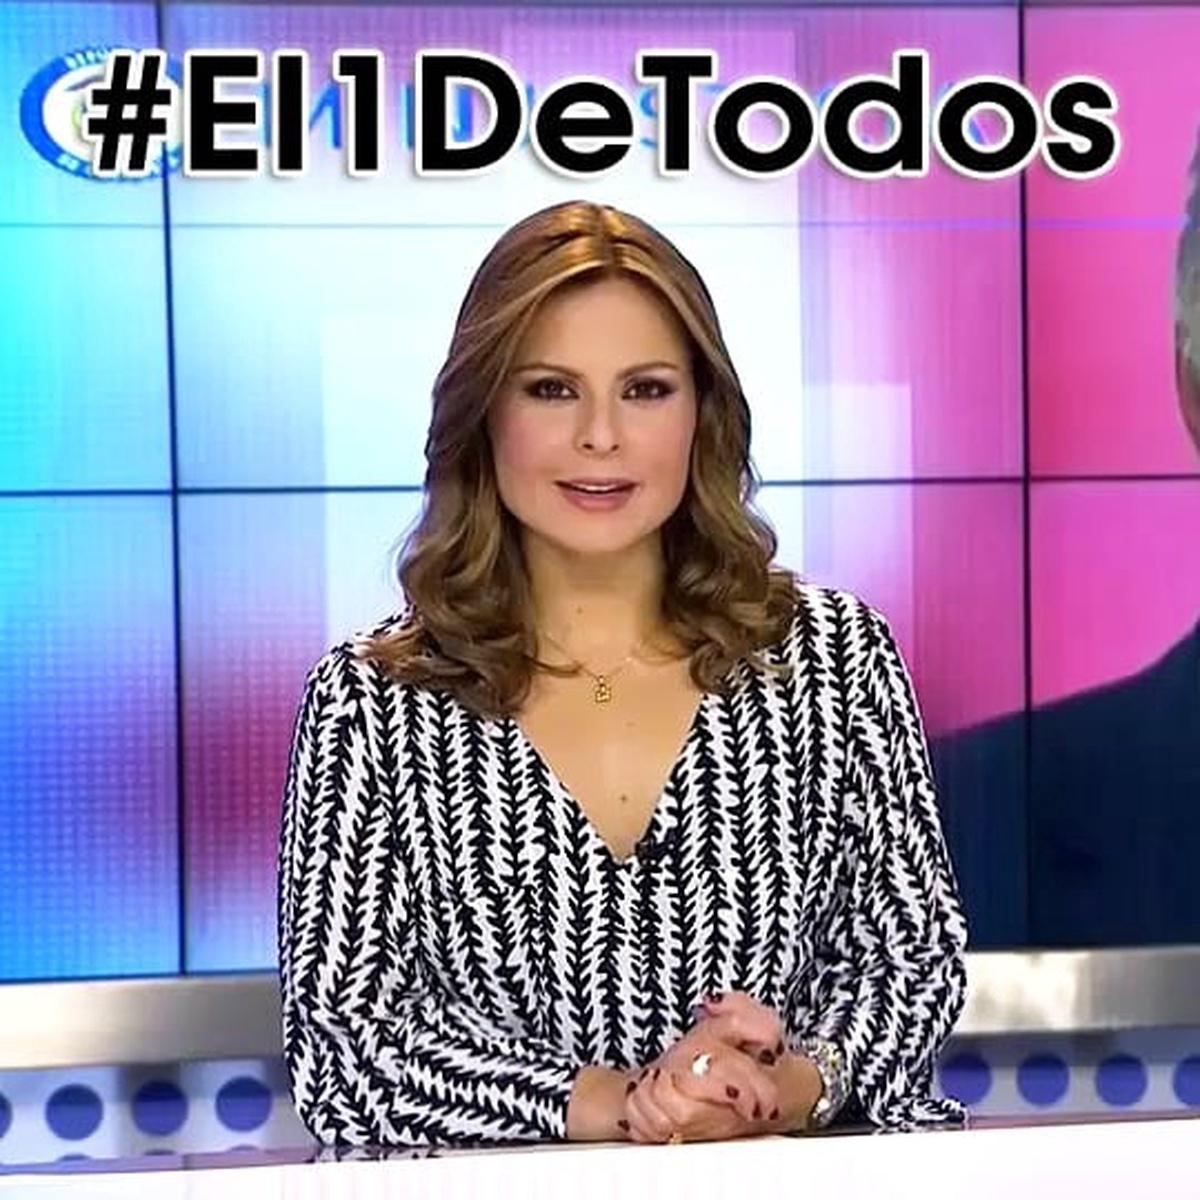 #elunodetodos